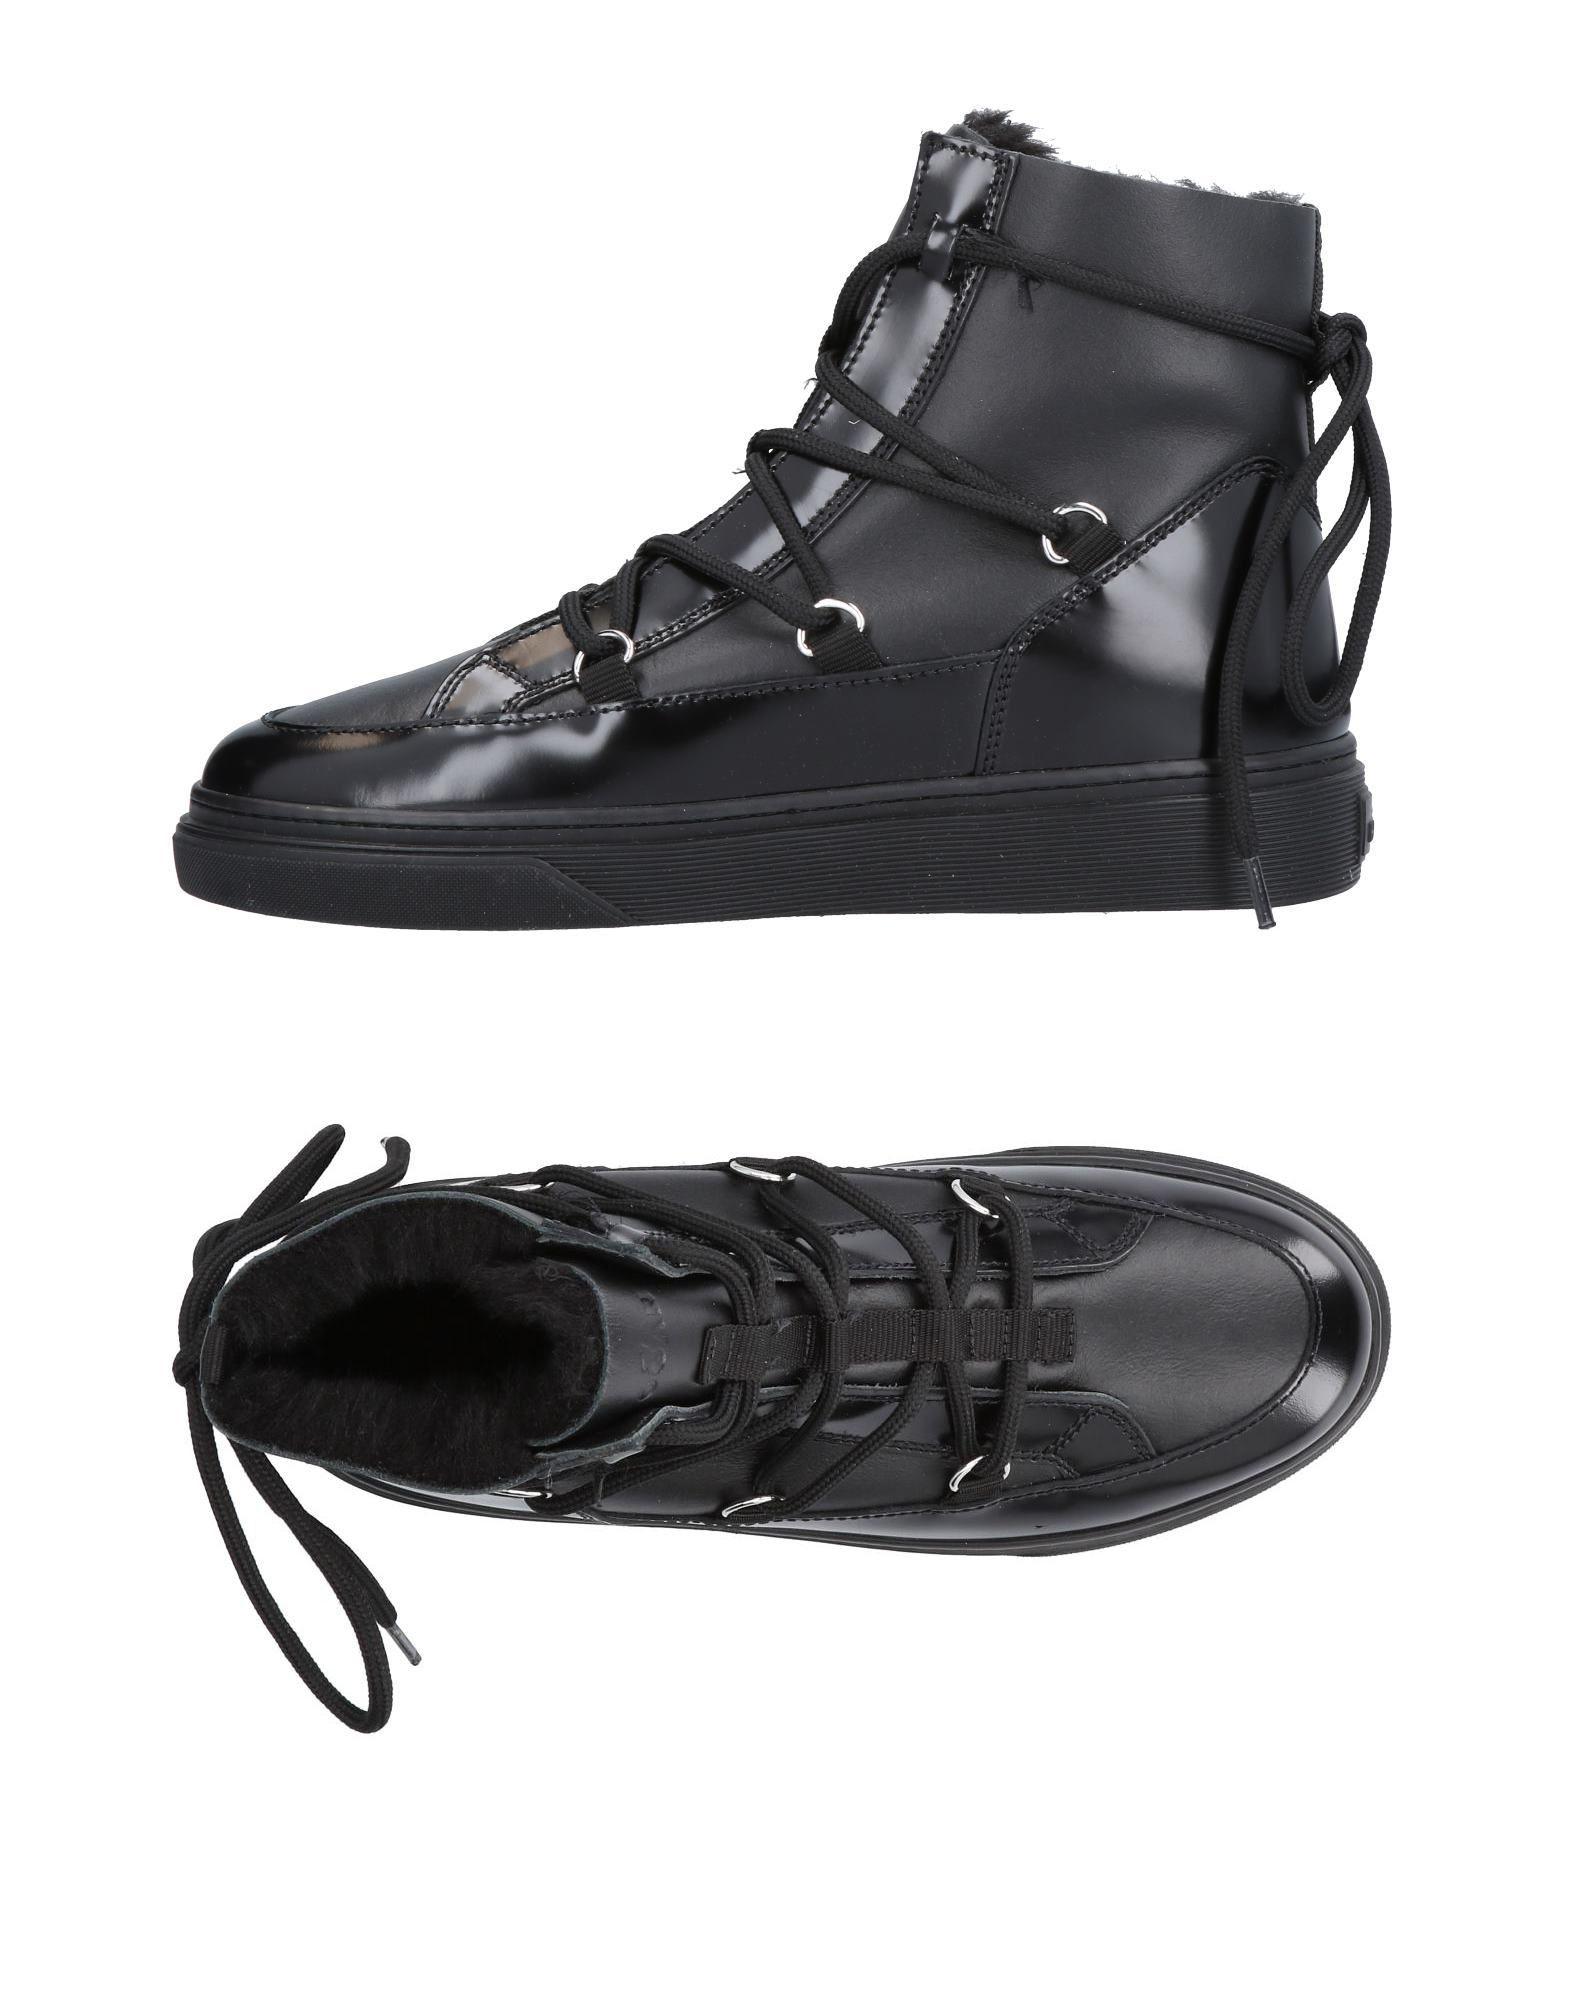 Hogan Sneakers Damen  11476018VQGut aussehende strapazierfähige Schuhe